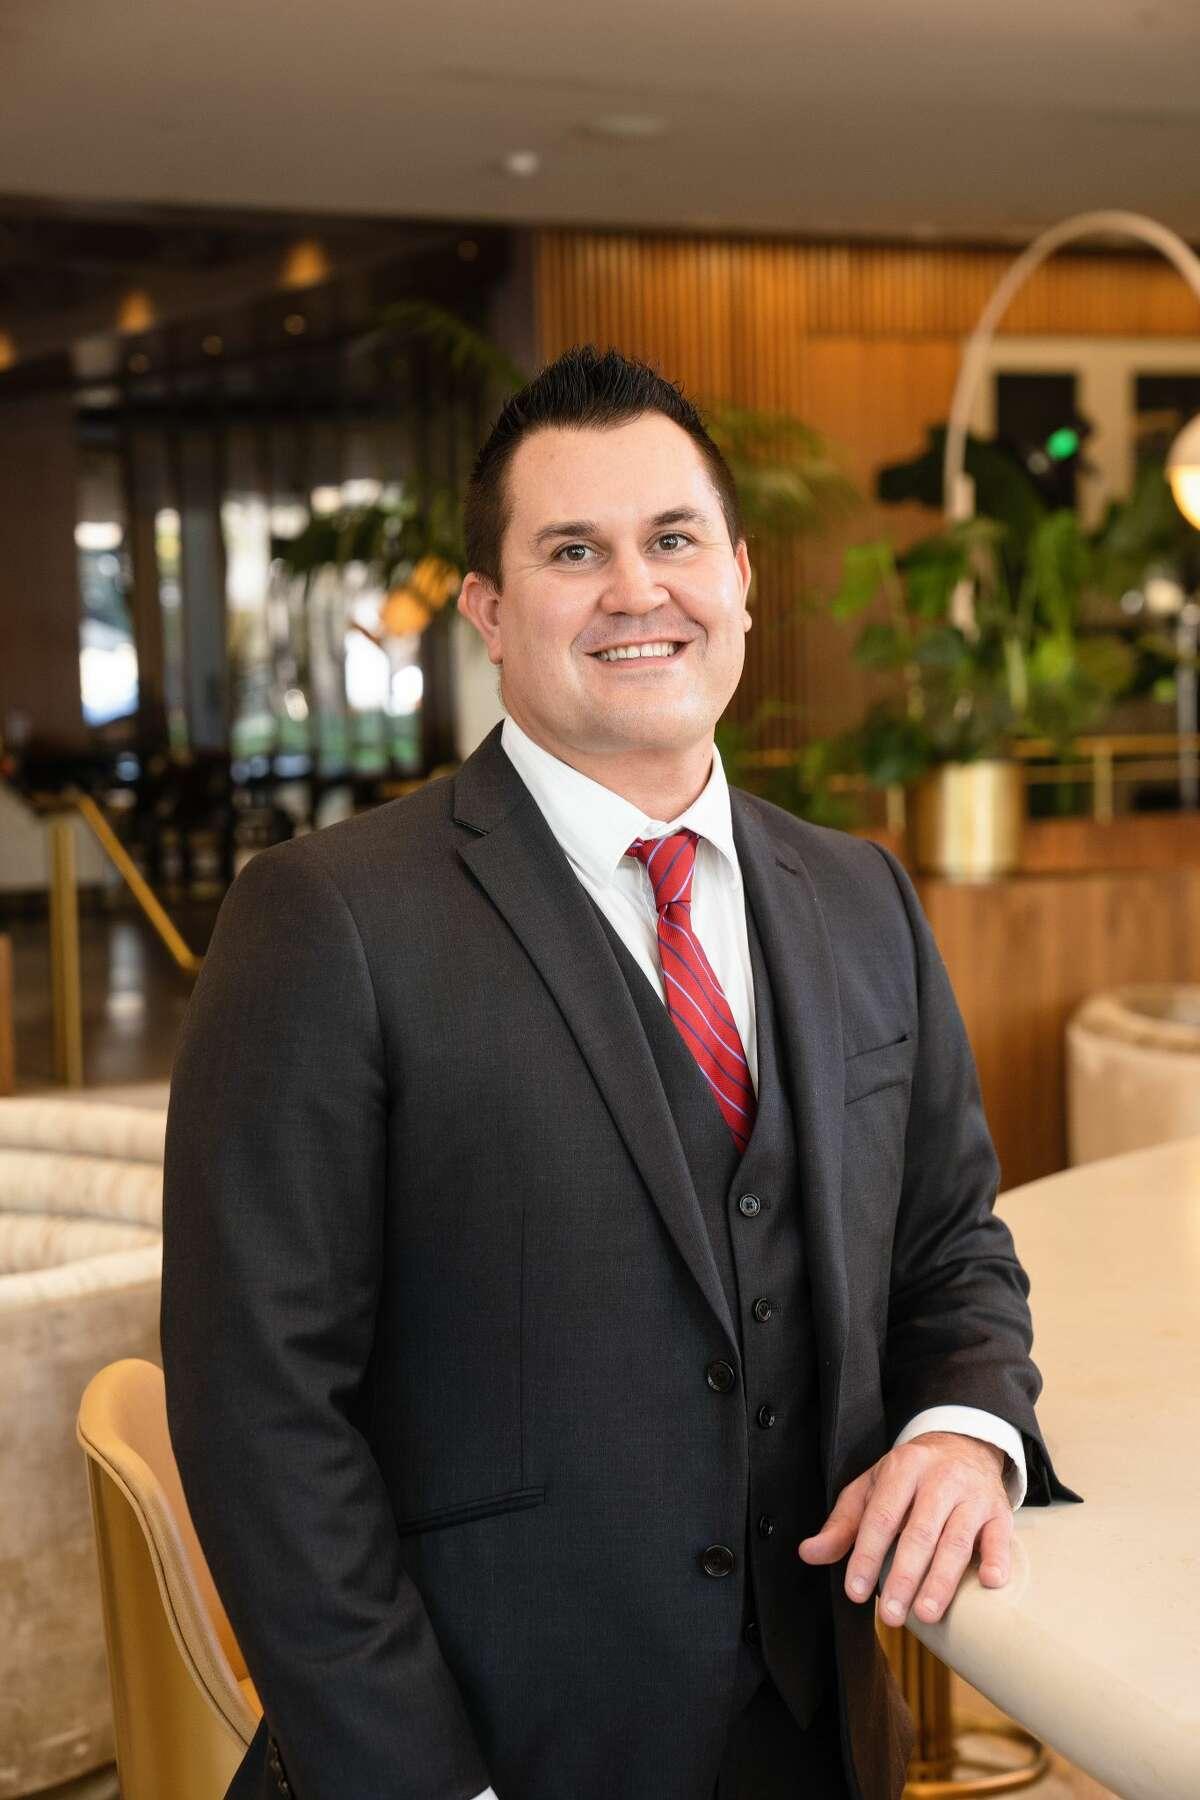 Chris Niederschulte is general manager of the C. Baldwin Hotel.